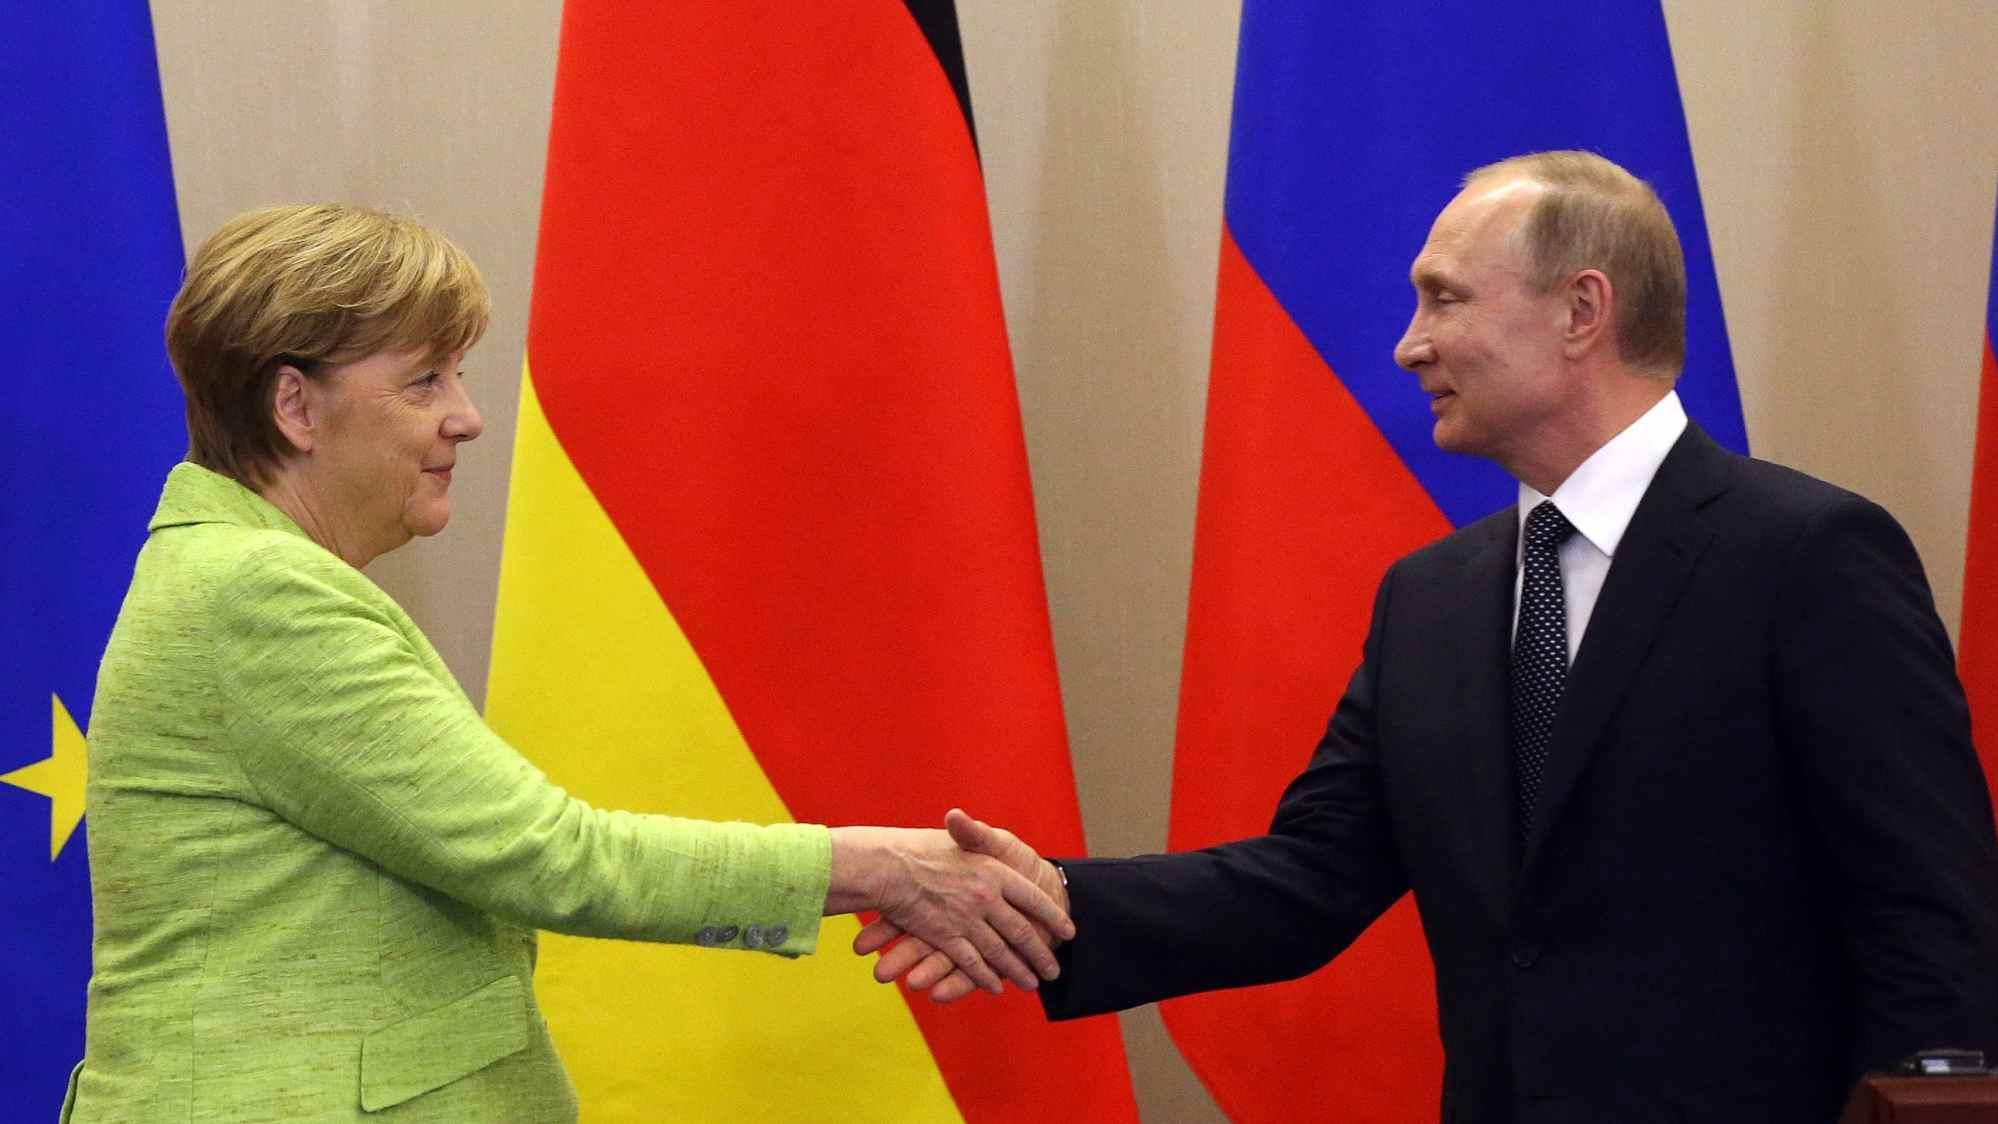 Putin, Merkel exchange congratulations on 75th anniversary of Nazi defeat